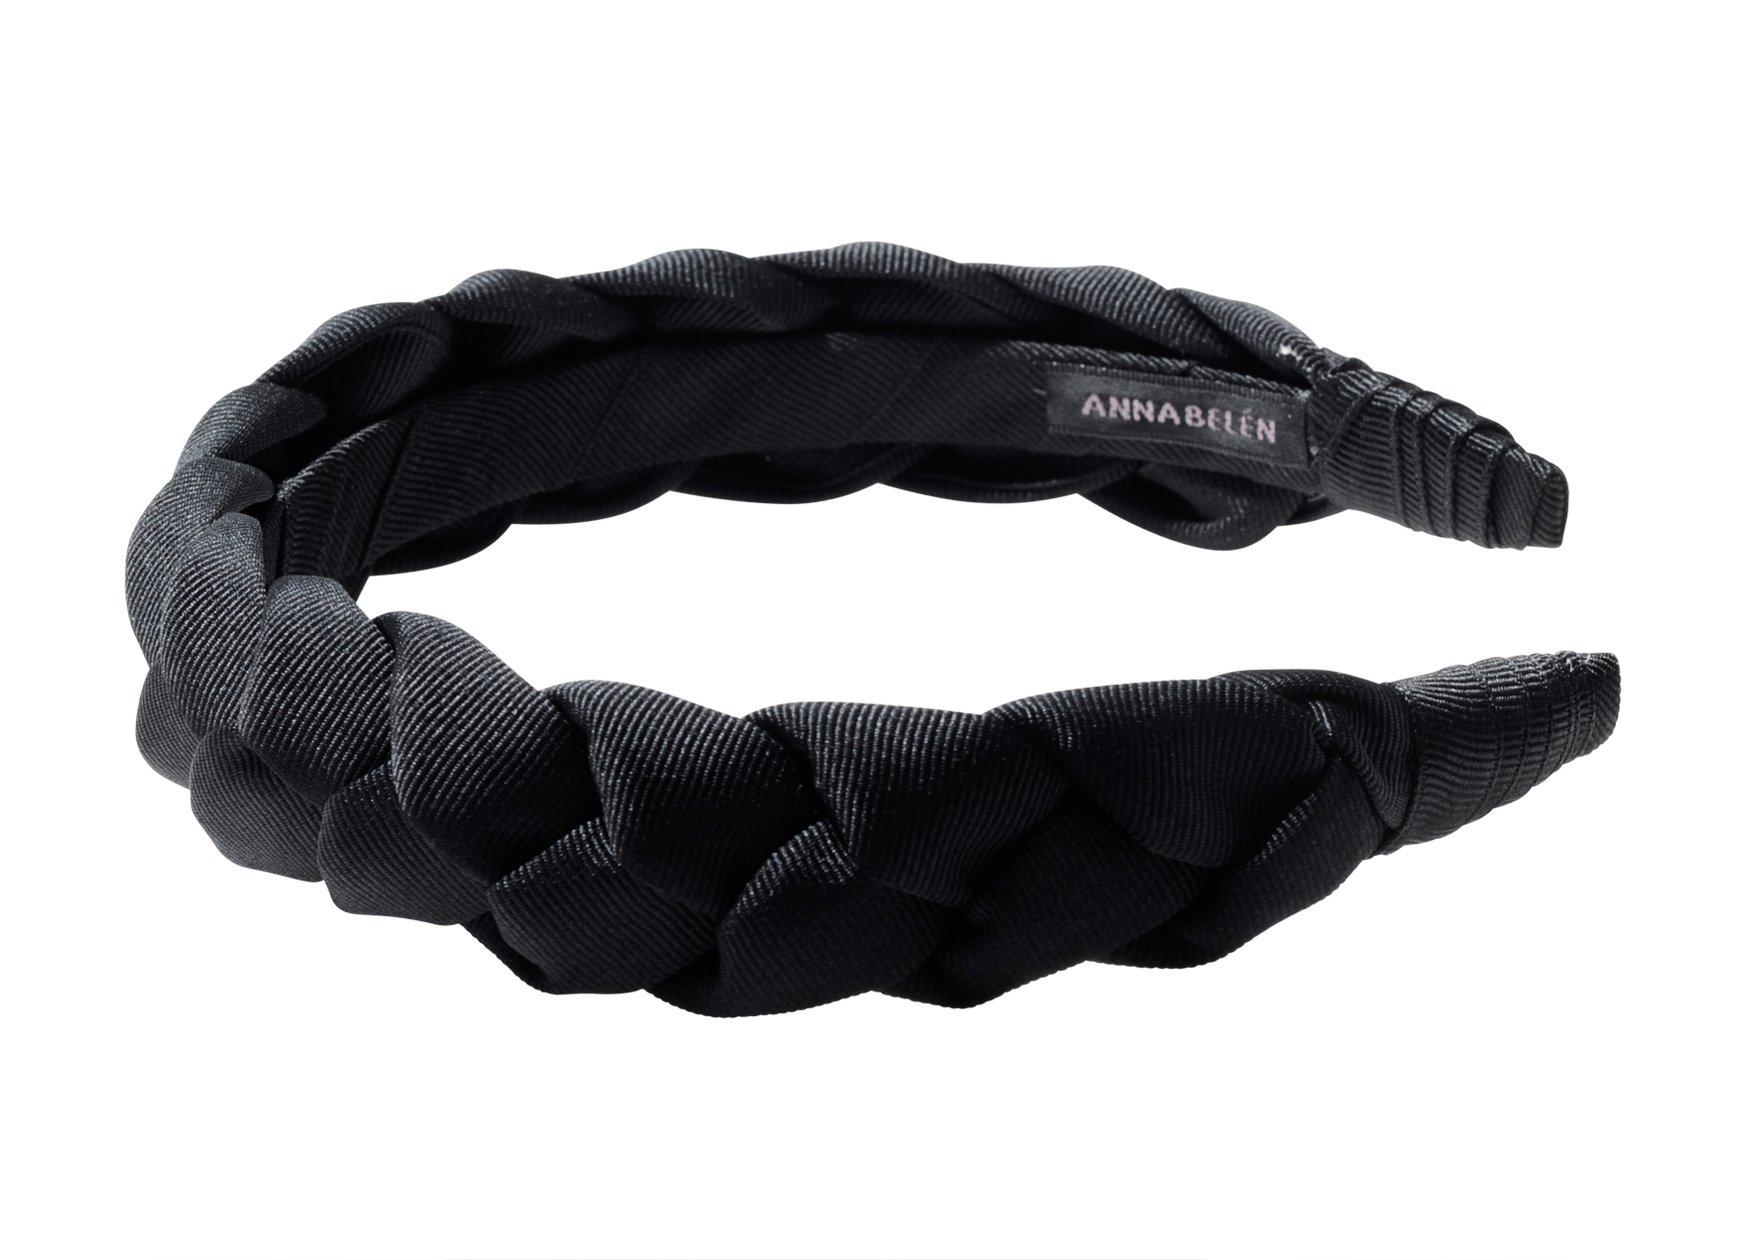 Anna Belen ''Gemma'' Braided Grosgrain Ribbon Headband O/S Black